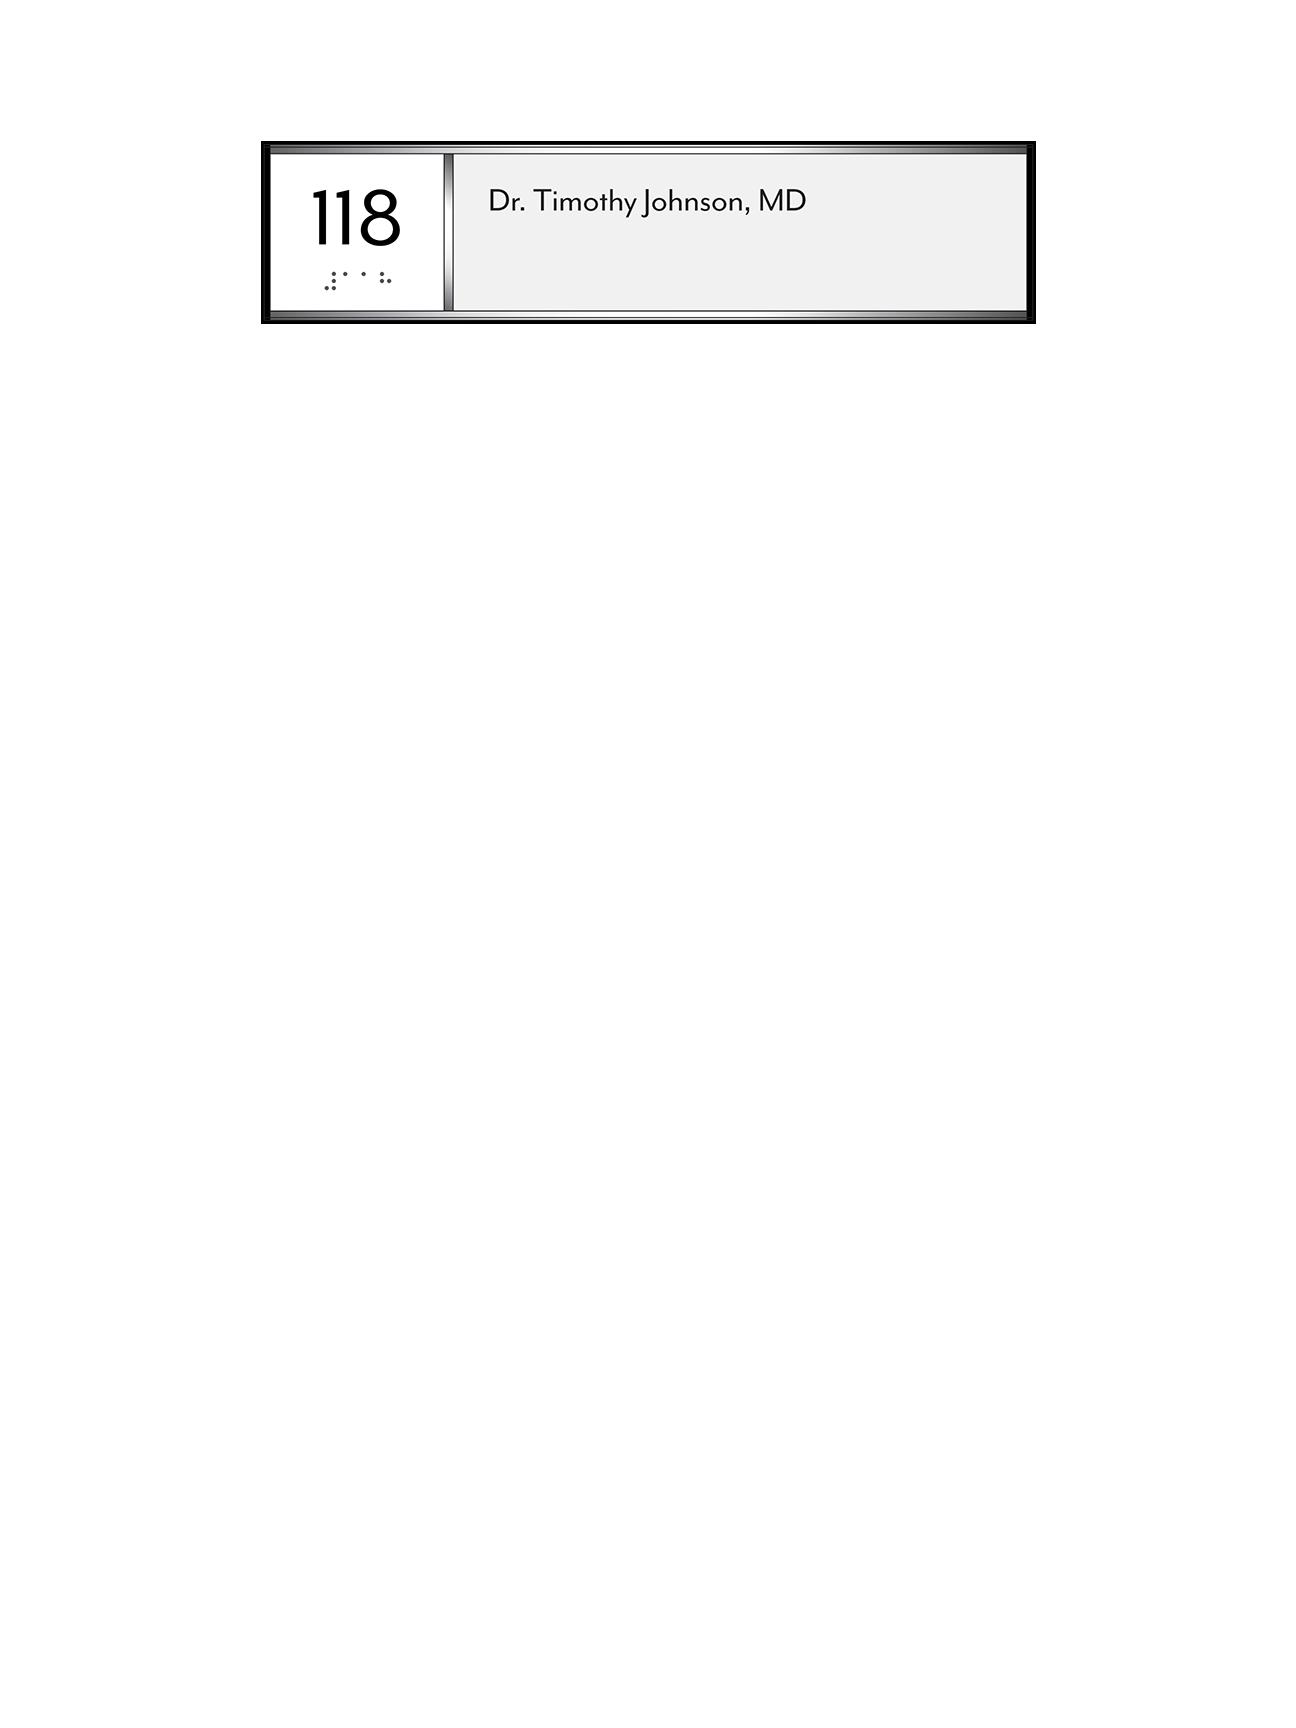 Sign:Unit ID w/ Occupant Name